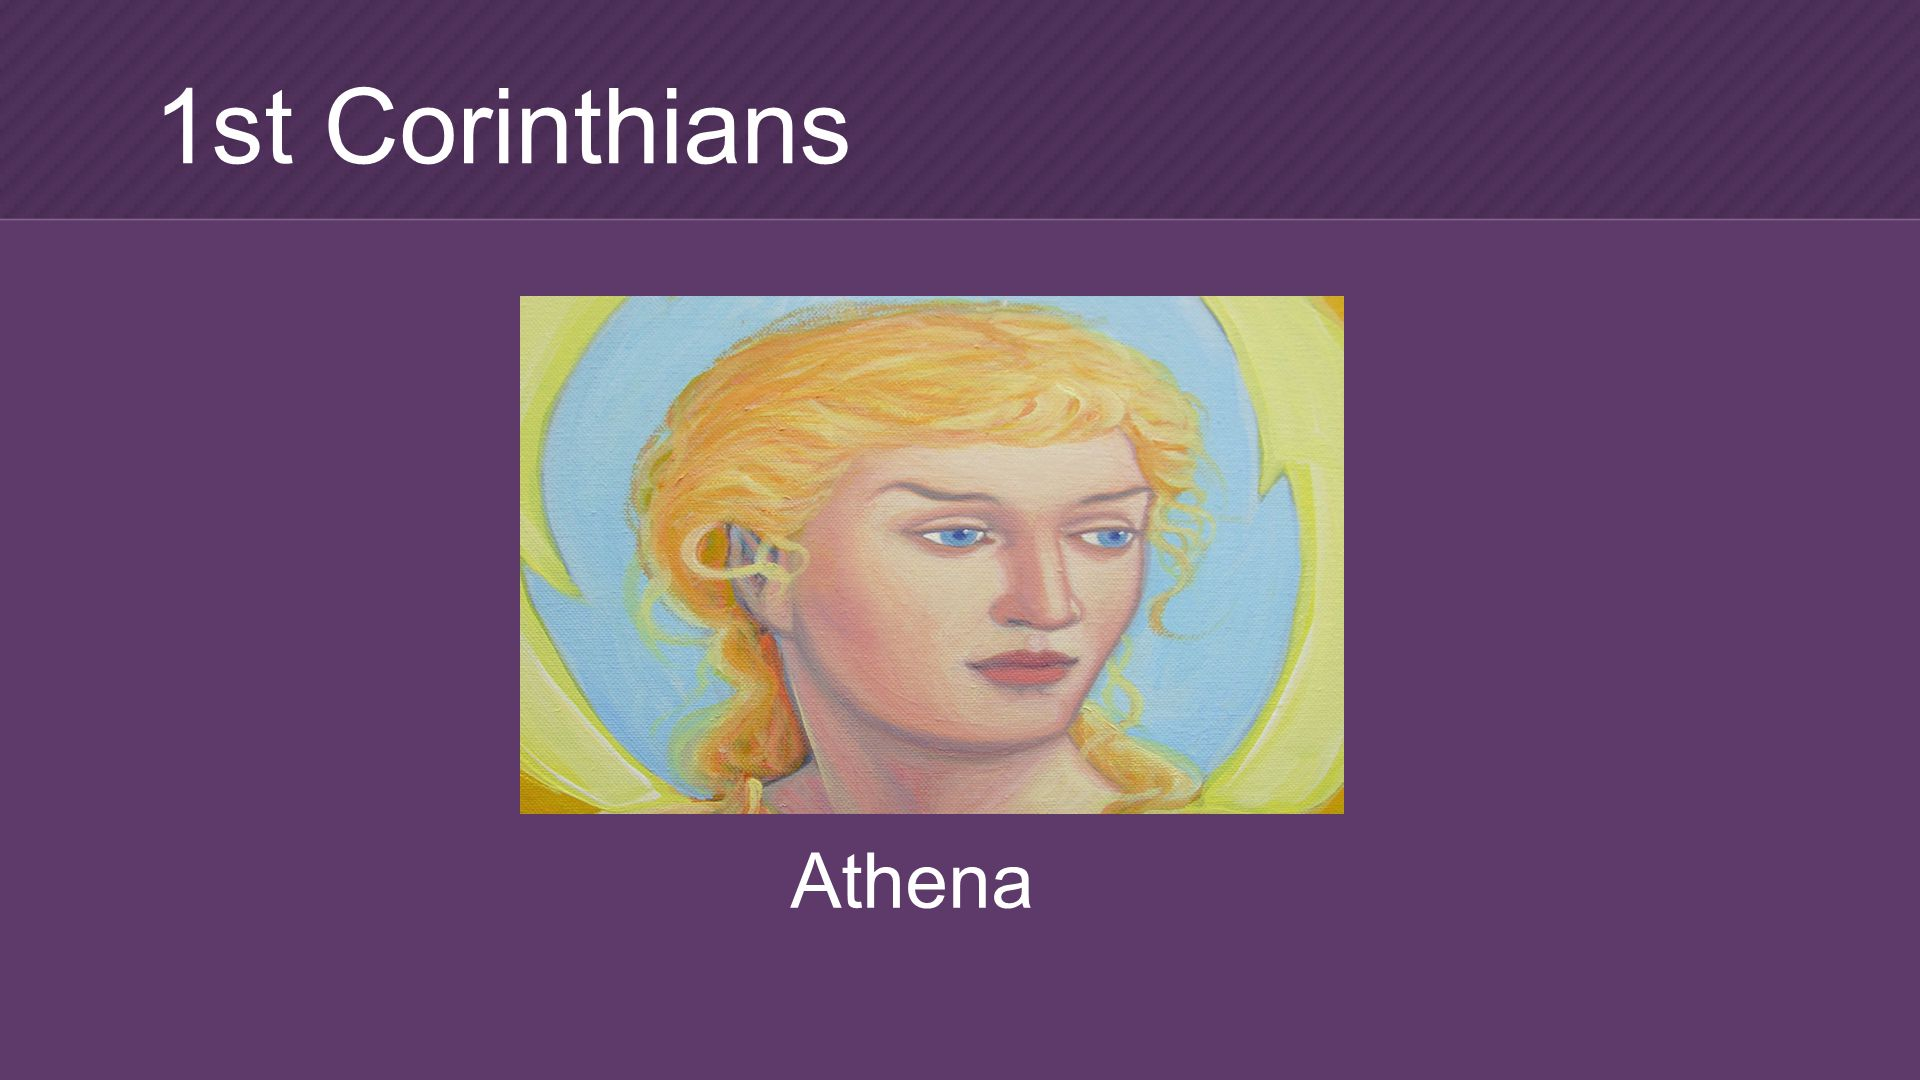 Athena 1st Corinthians